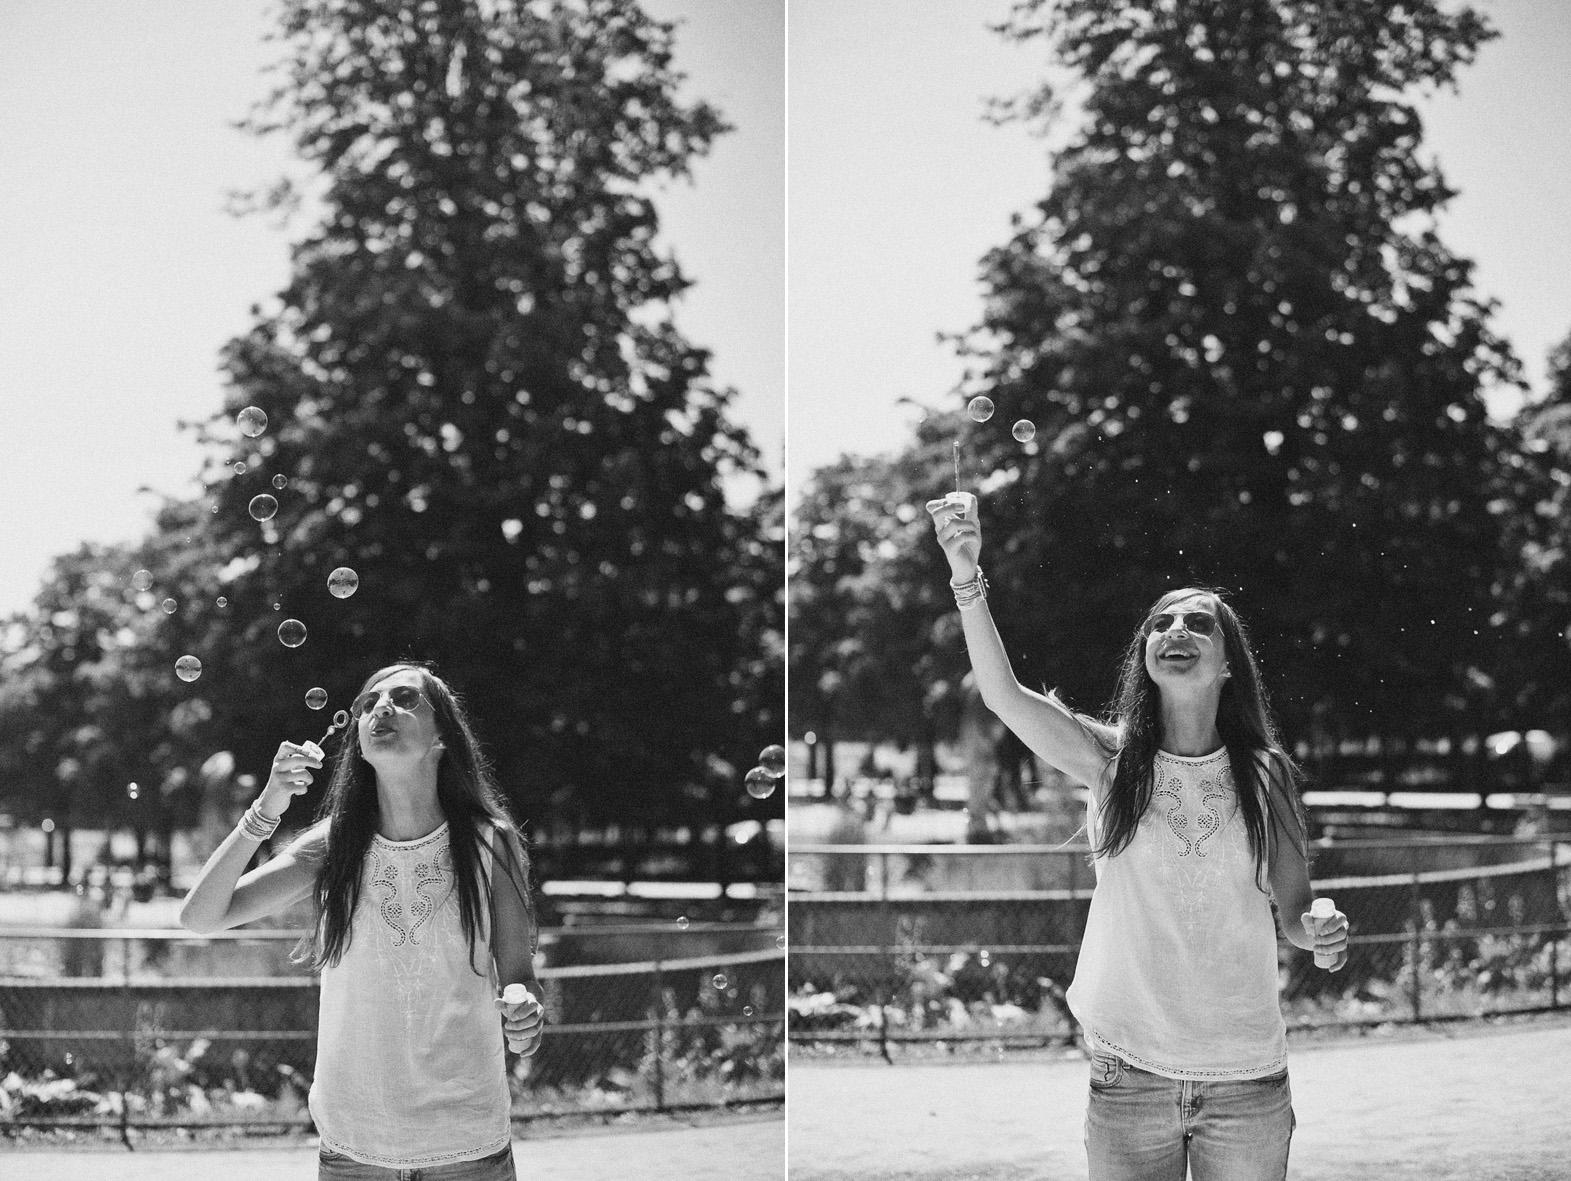 evjf_laura_photographie_c-leemence_dubois-mep-1.jpg